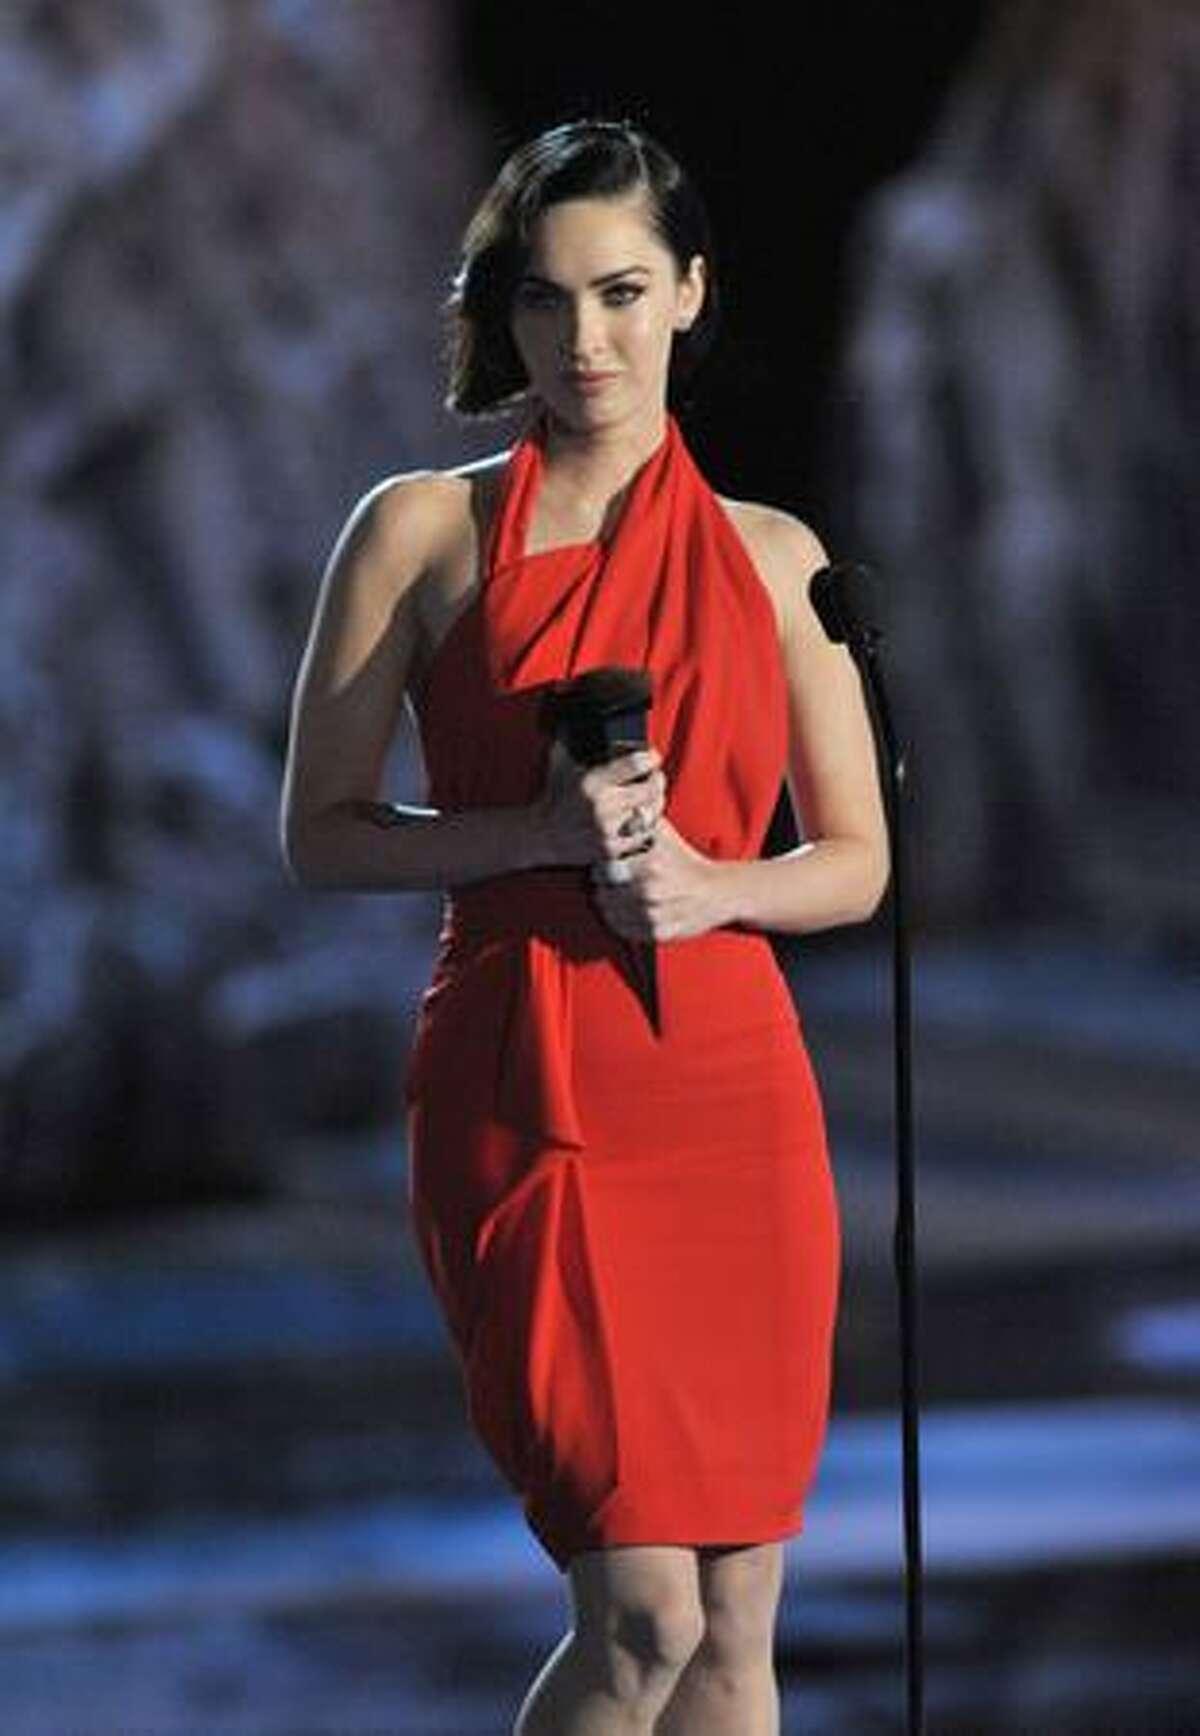 Actress Megan Fox accepts the Best Sci-Fi Actress award onstage.